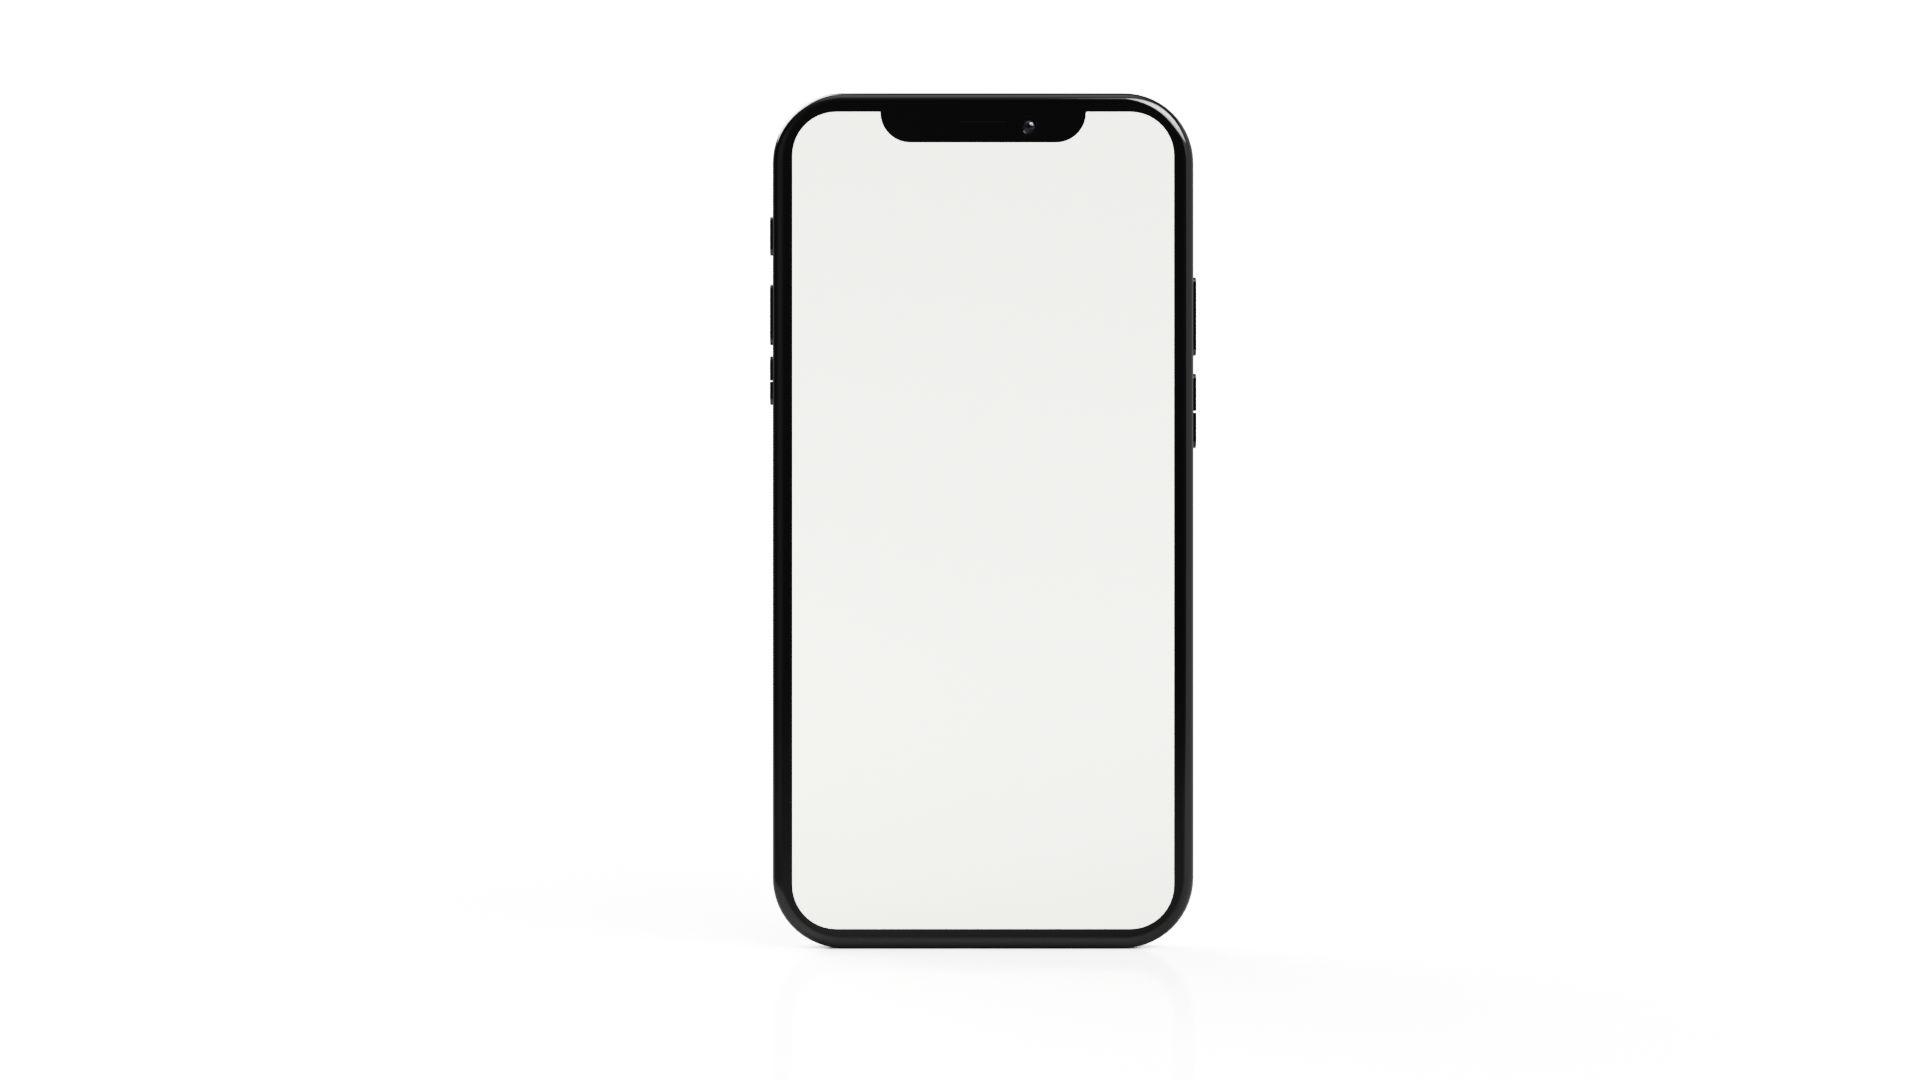 Iphone-1-3500-3500